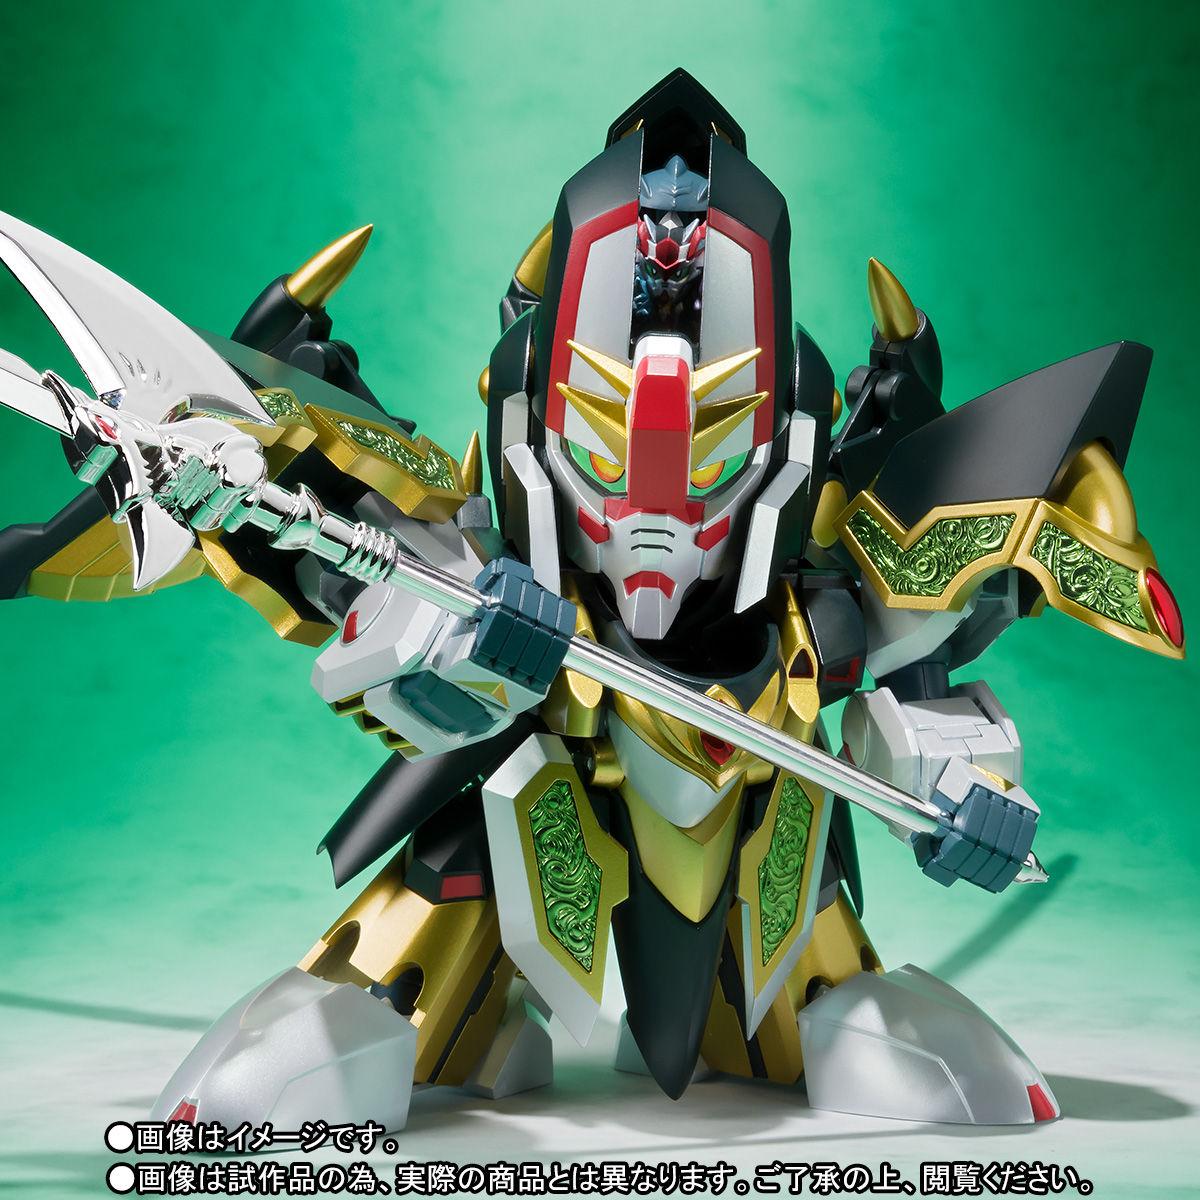 SDX『龍機ドラグーン 新SDガンダム外伝』可変可動フィギュア-001